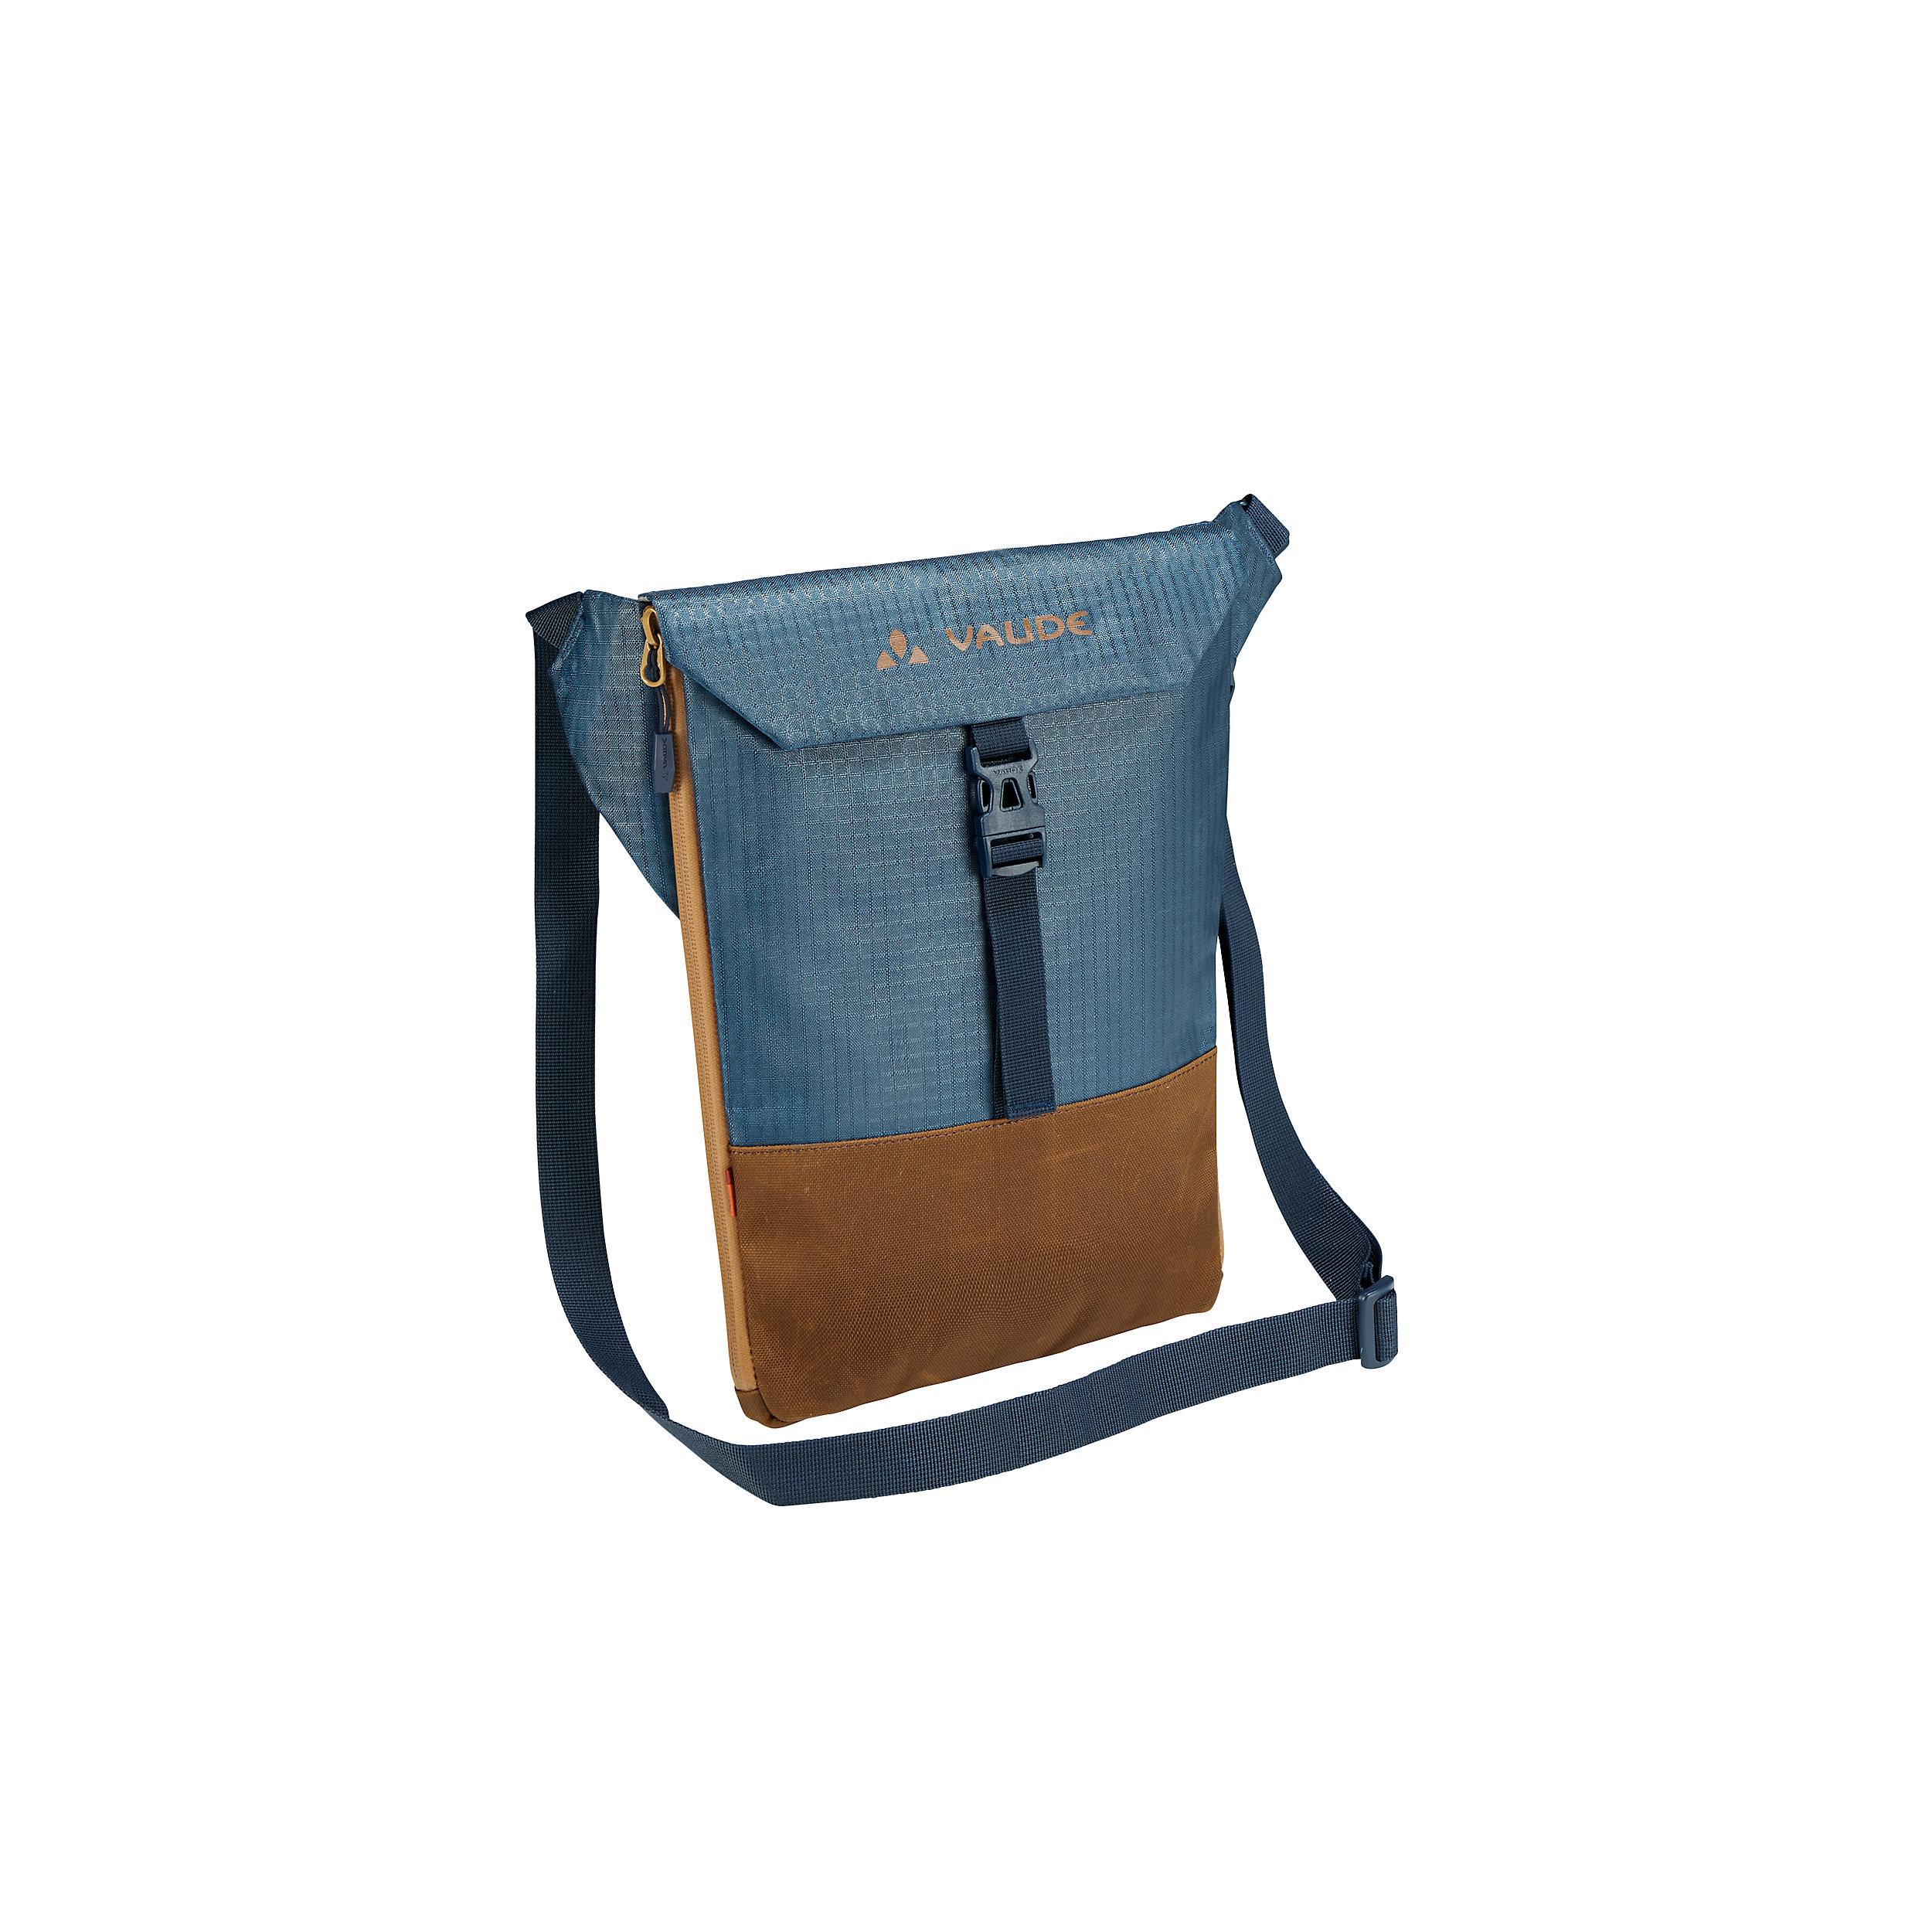 Crossbody Bag CityAcc reversible City 3.5 Liter